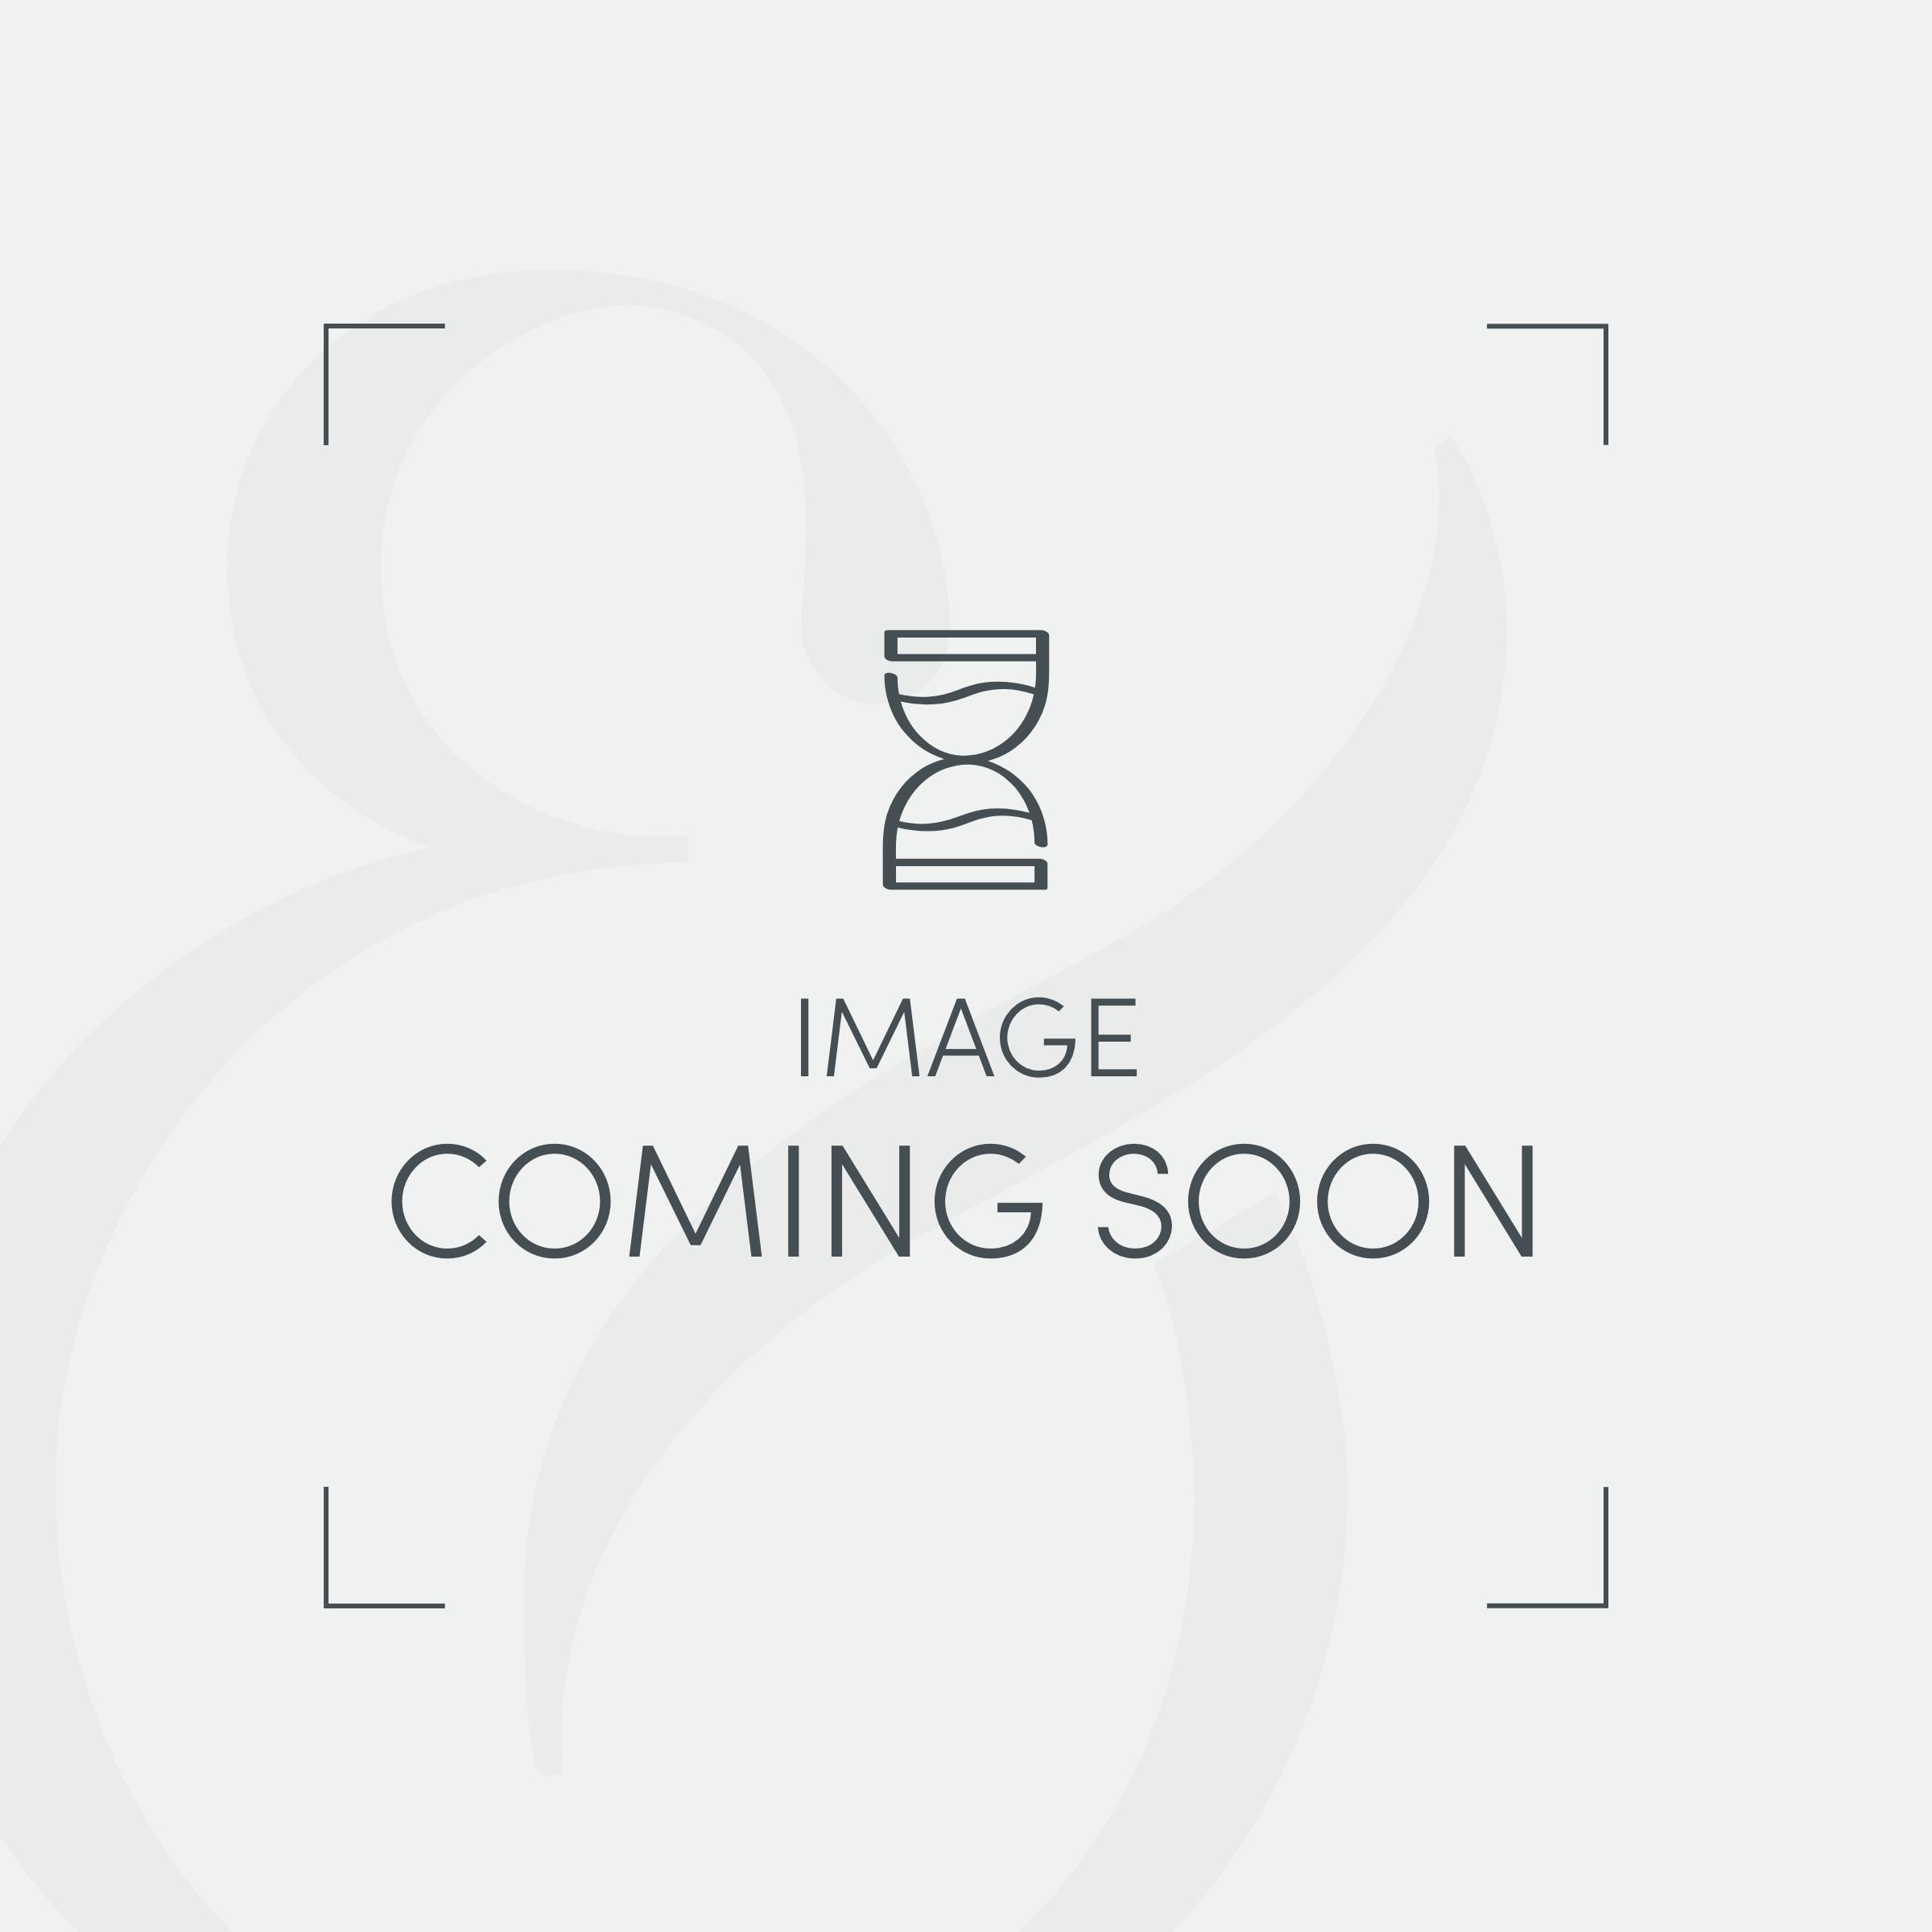 Luxury Cashmere 4000 Pocket Air Spring Pillow Top Mattresses